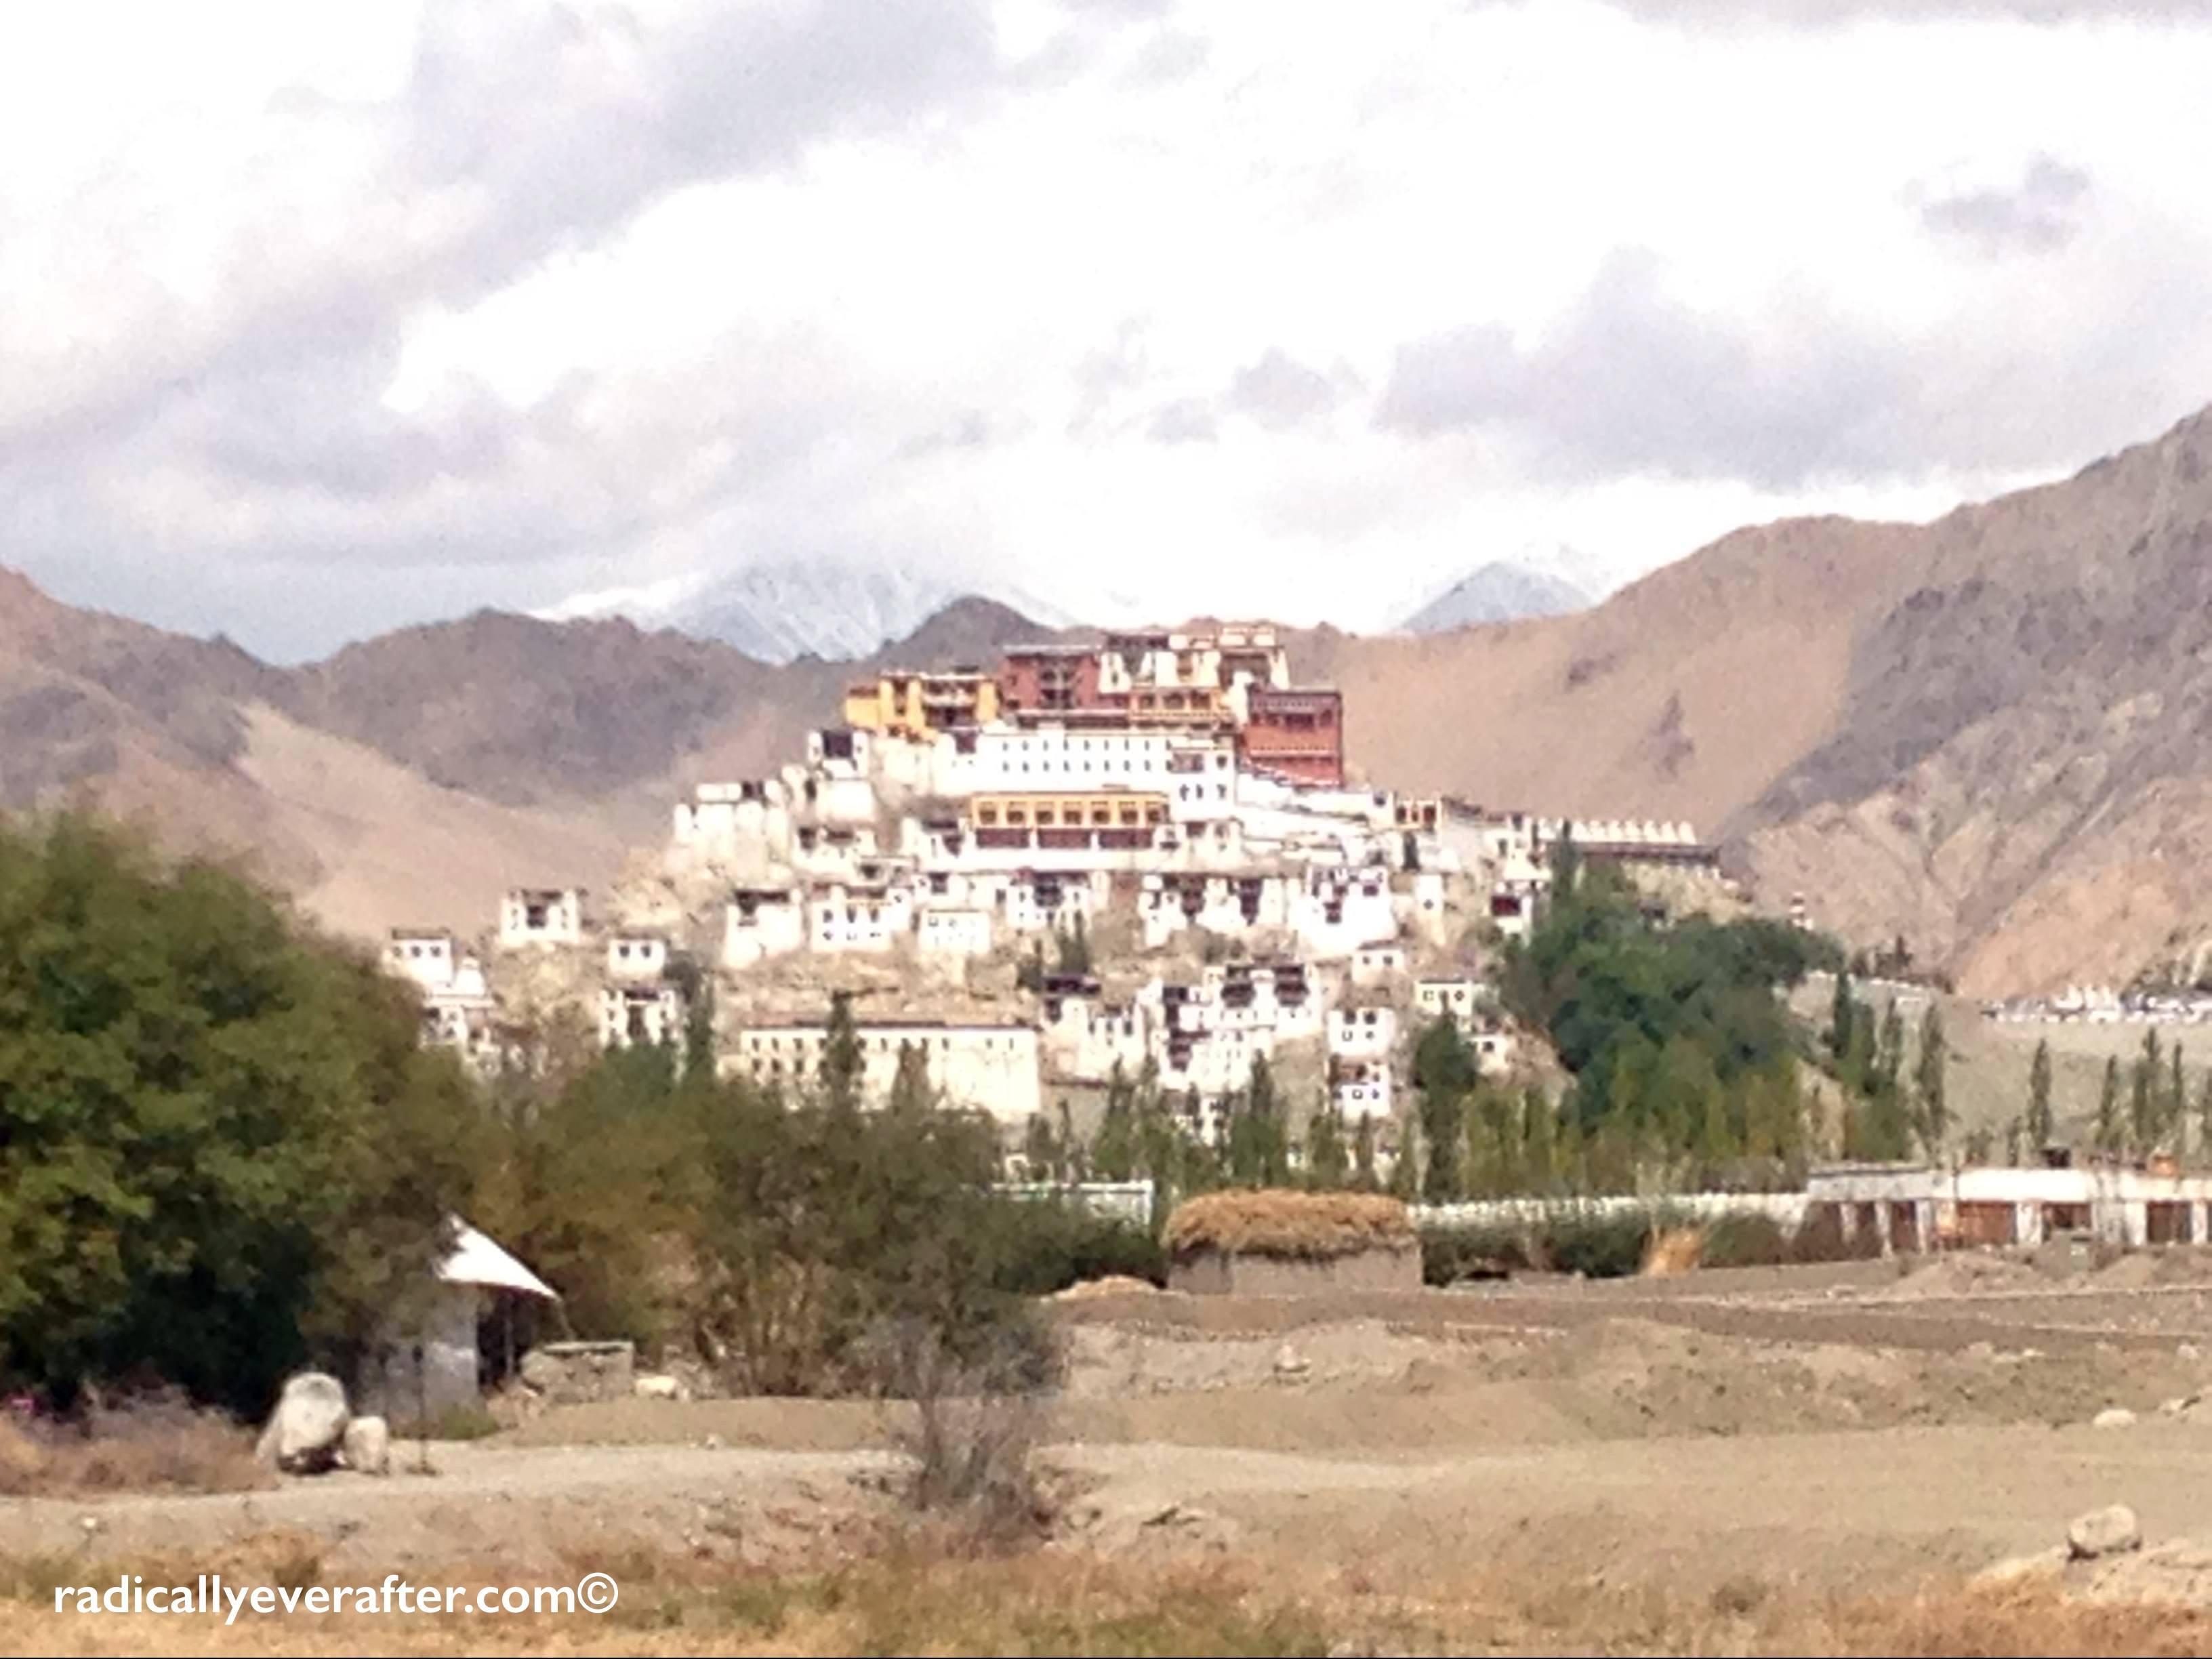 Thiksey, Ladakh, Leh, monastery, Himalayas, glamping, TUTC